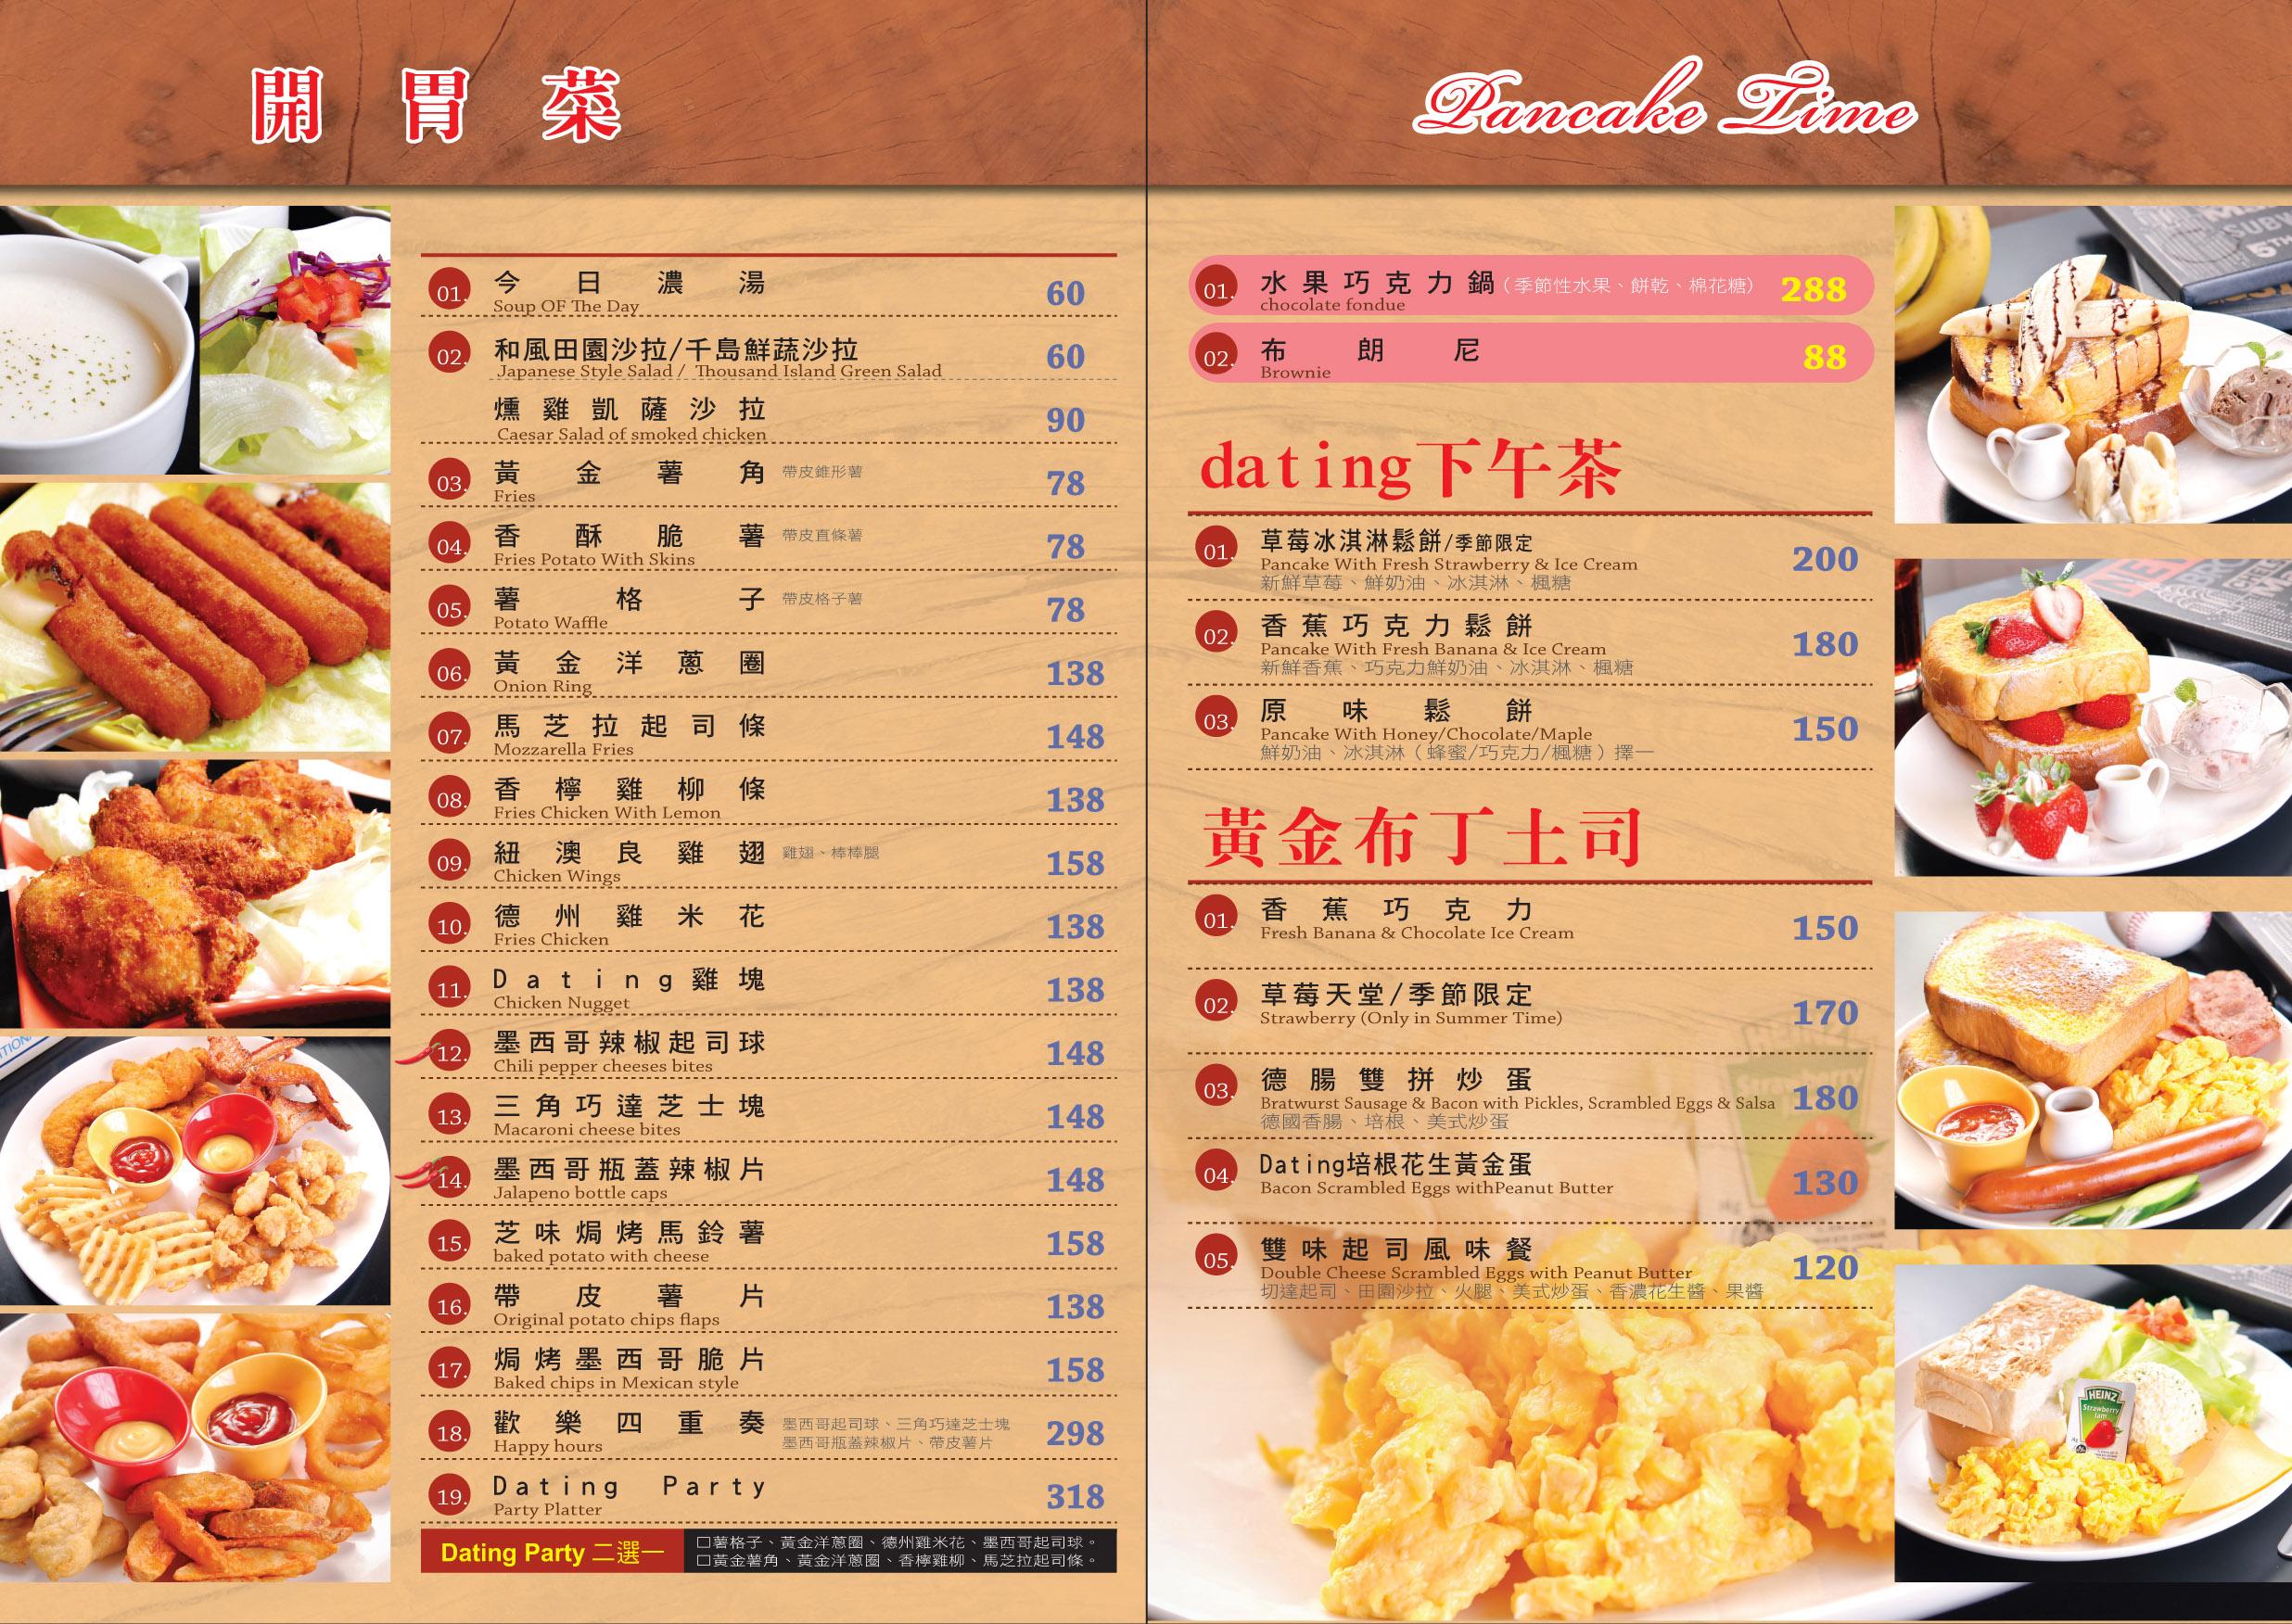 The Dating Burger 美式餐廳(羅東超人店):[宜蘭美食]羅東 ...